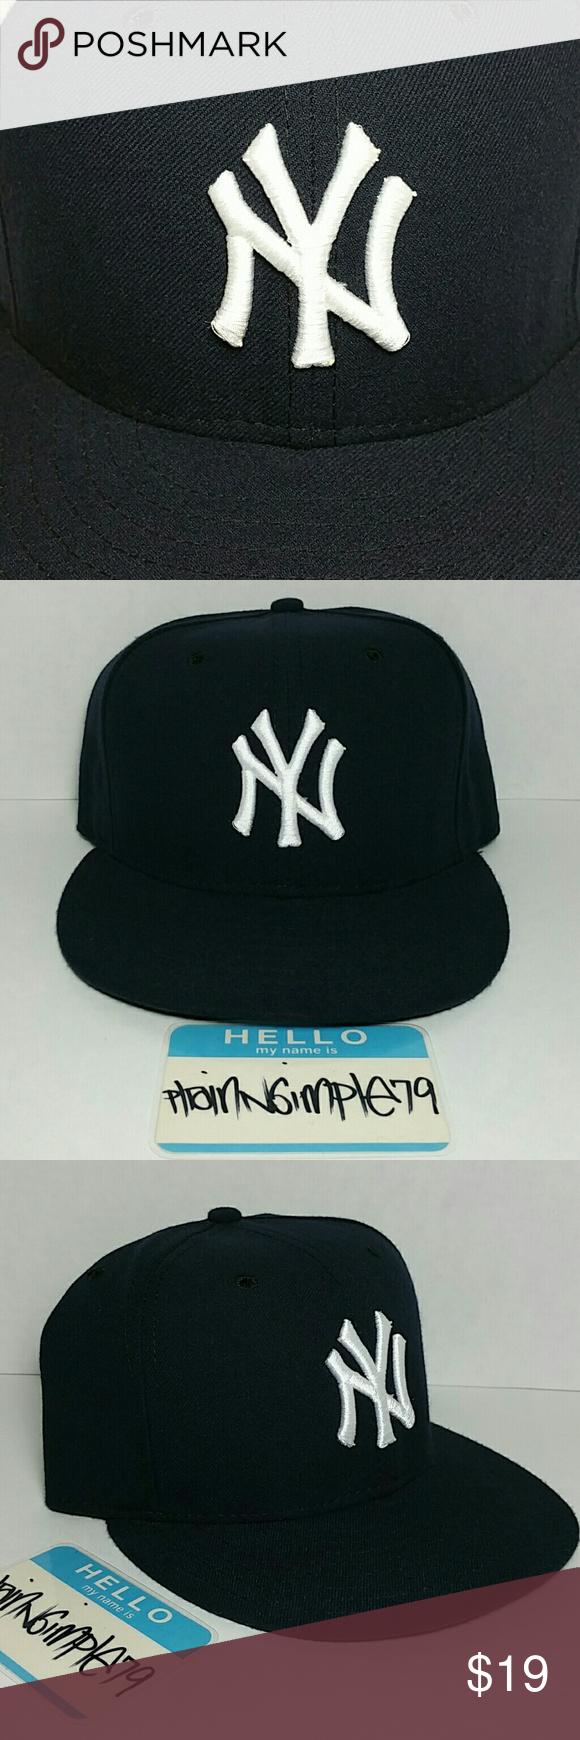 New York Yankees New Era Baseball Fitted Hat 7 3 8 Fitted Hats Baseball Fitted Hats New Era Fitted